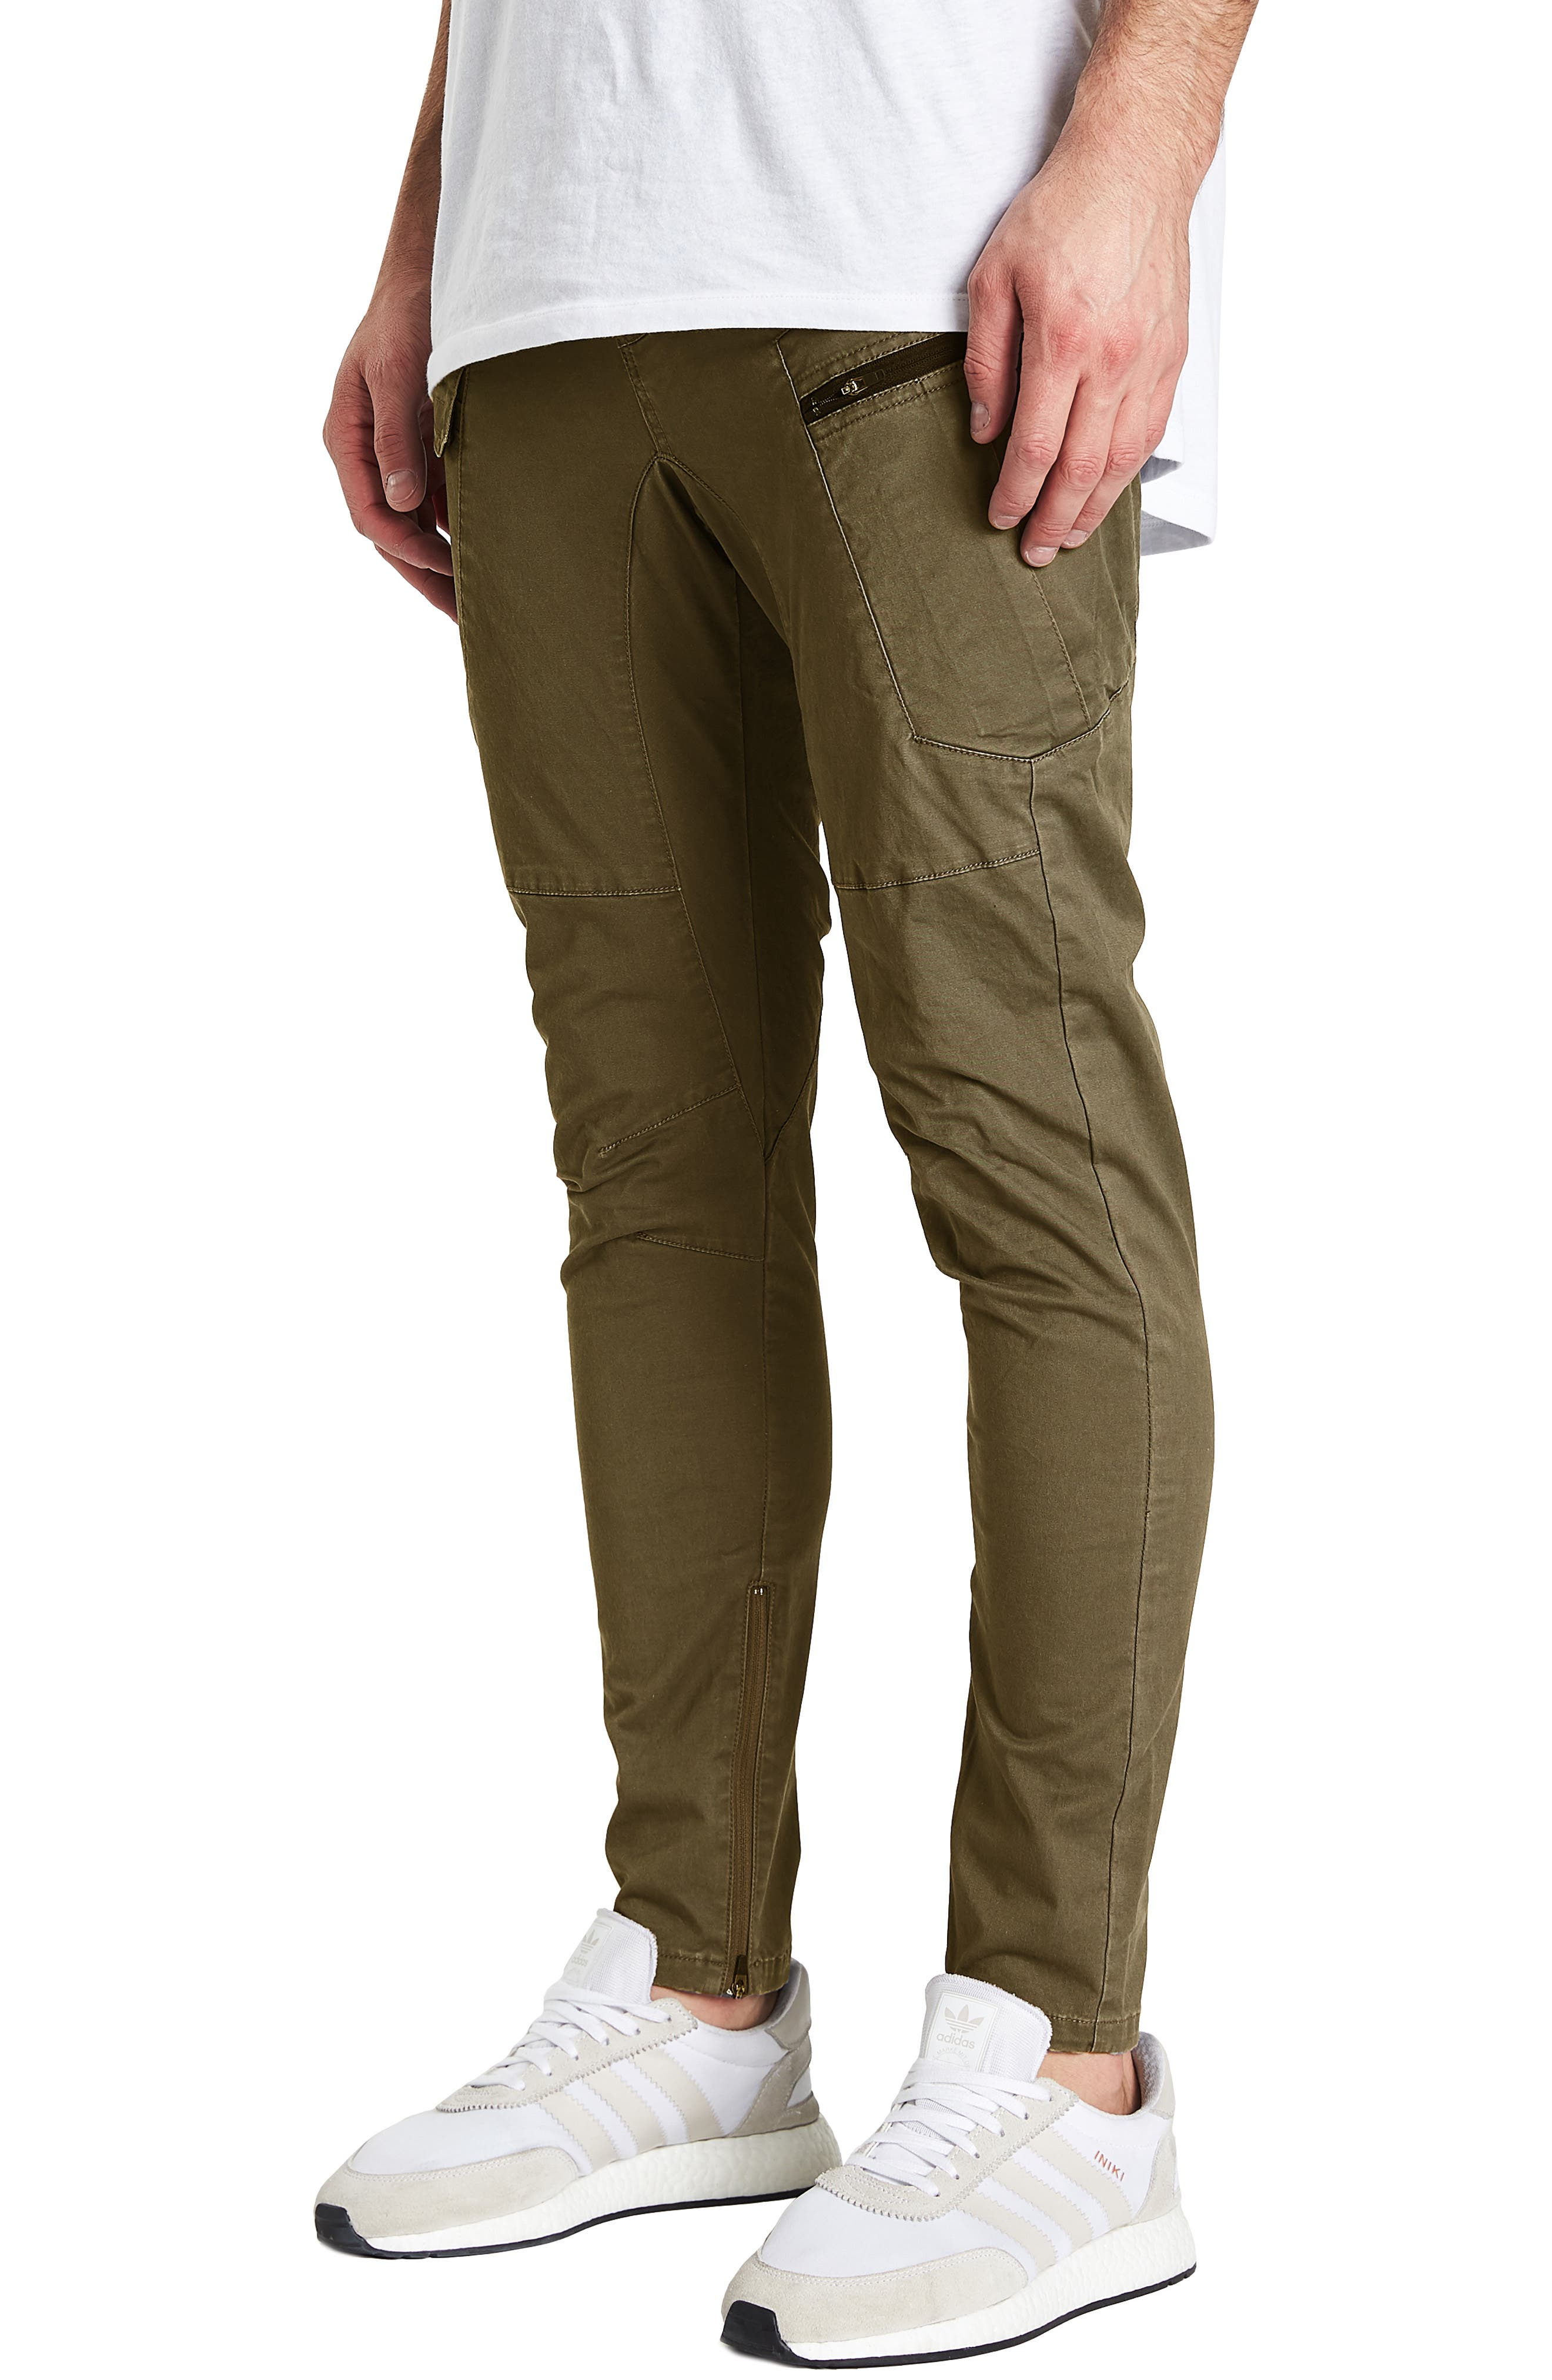 Tactical Slim Fit Pants,                             Alternate thumbnail 3, color,                             IVY GREEN